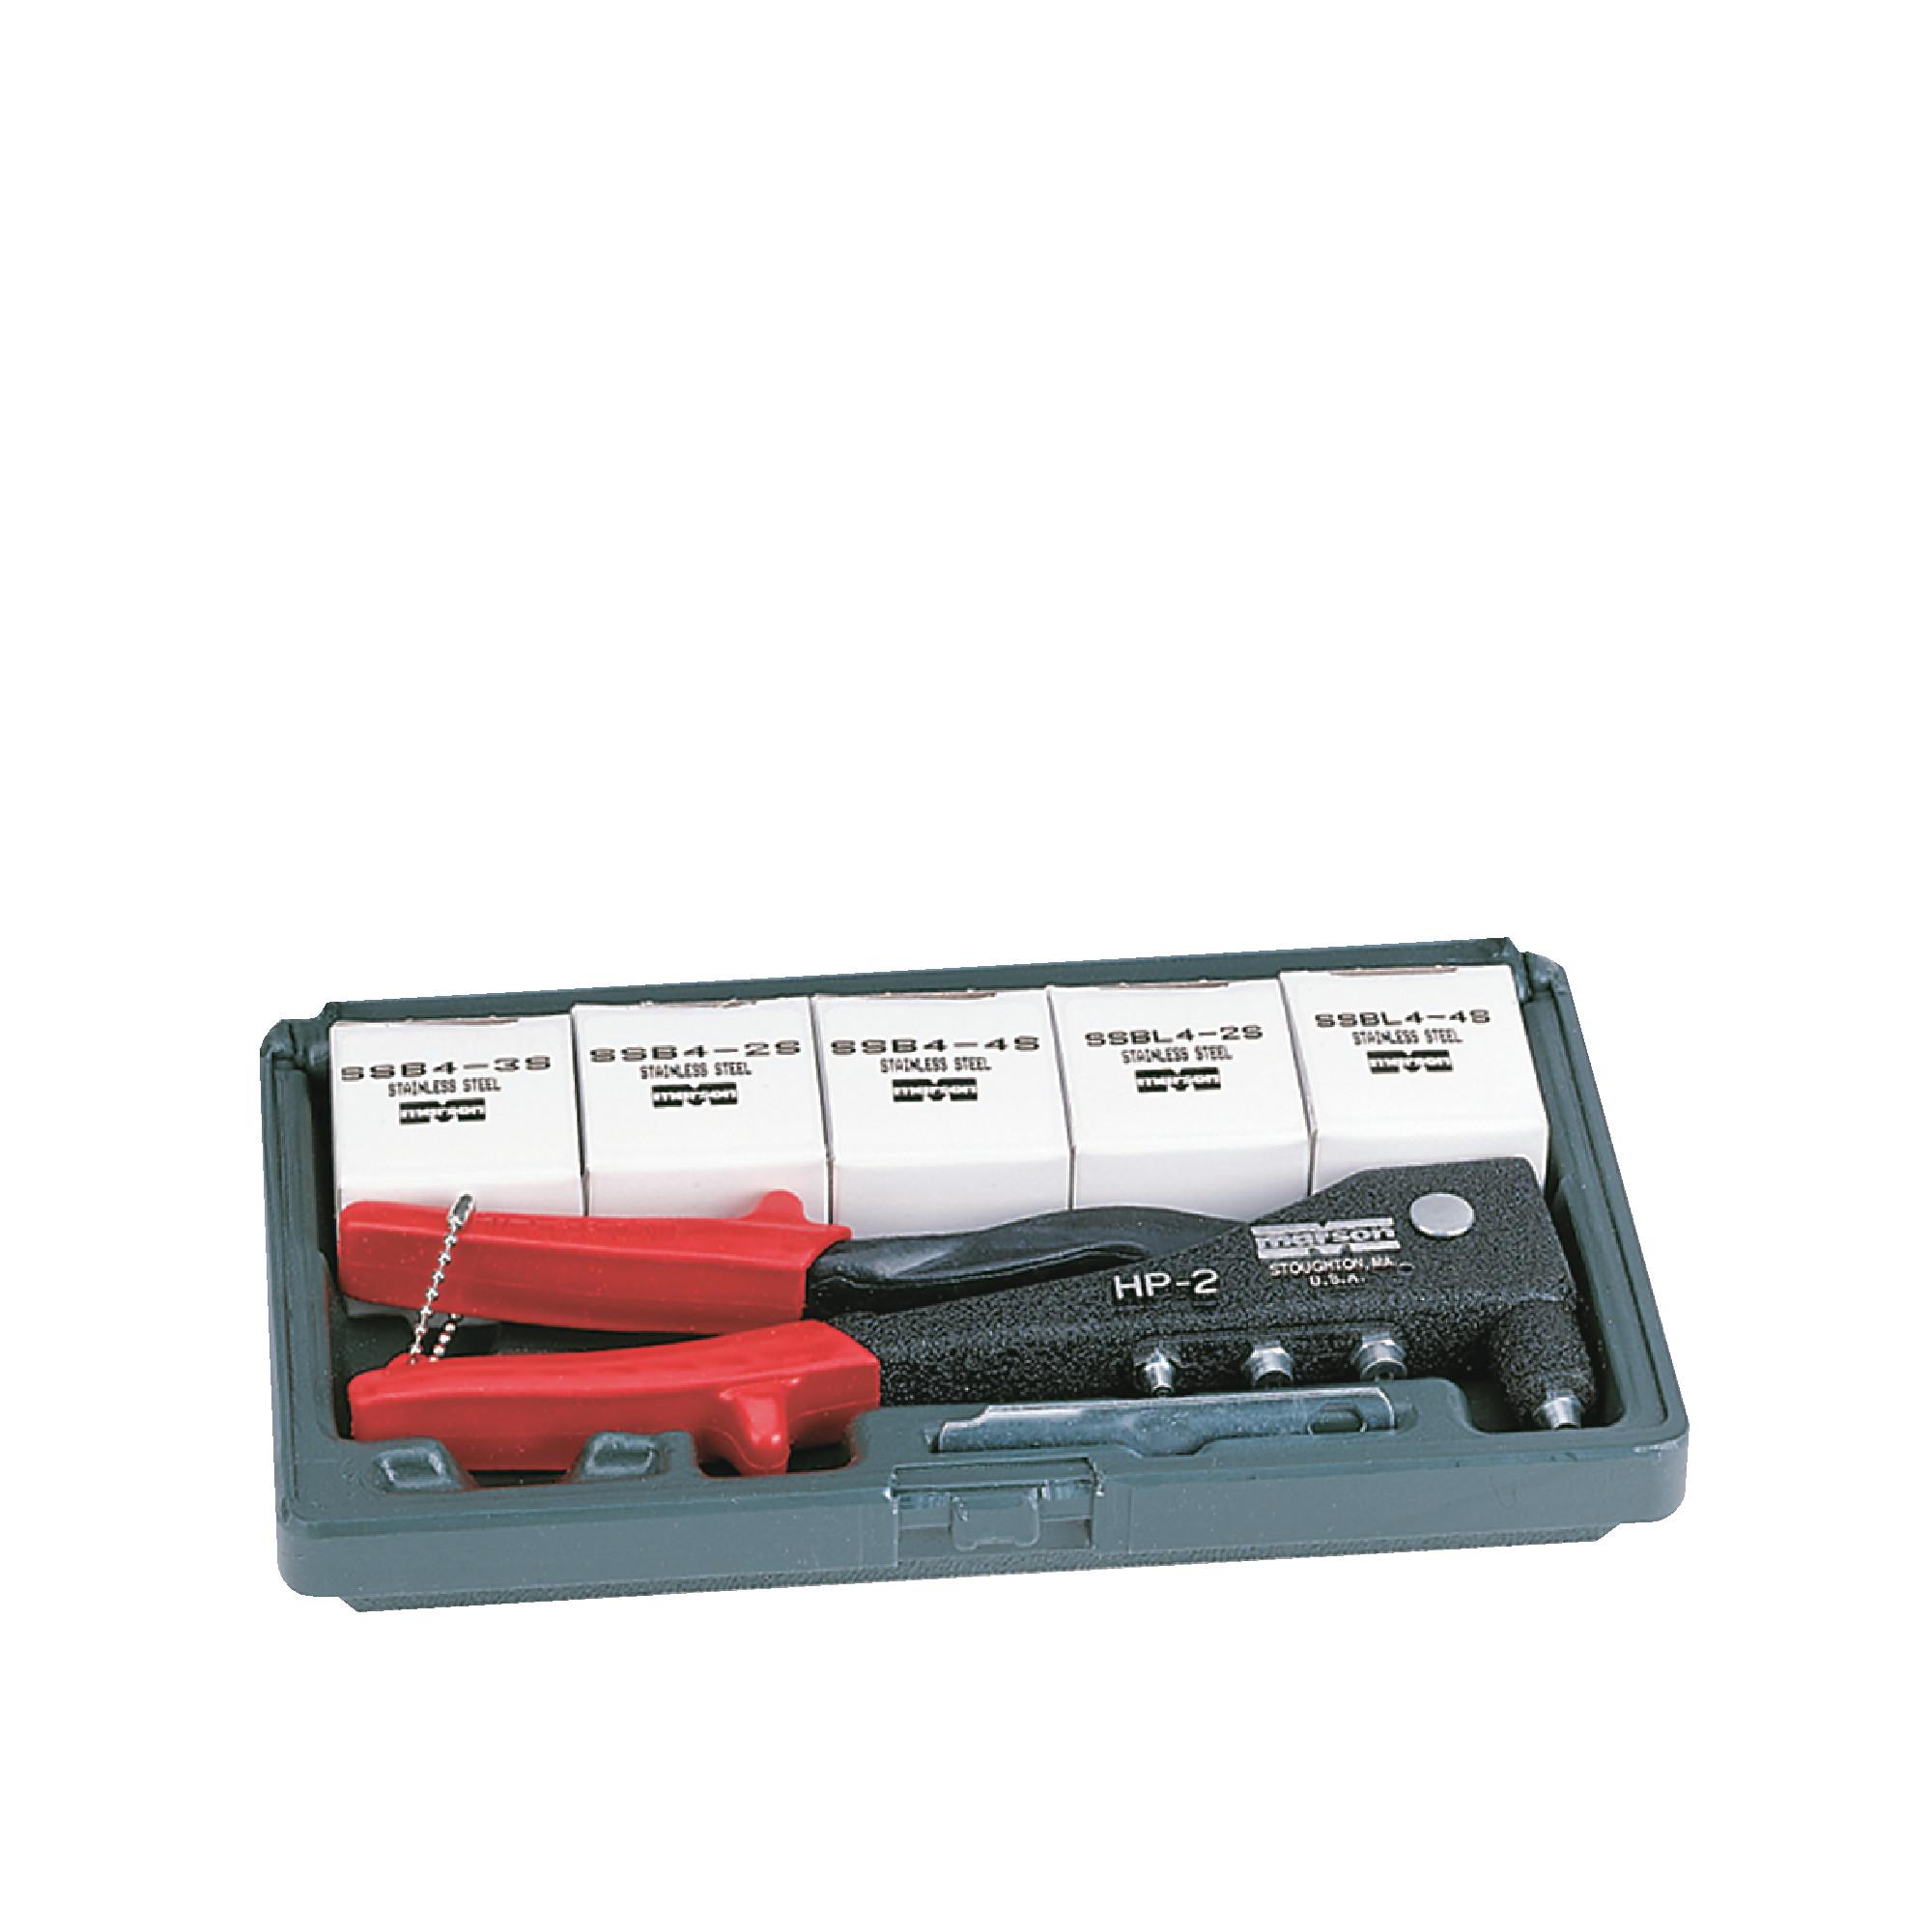 HP-2 Hand Rivet Tool Set